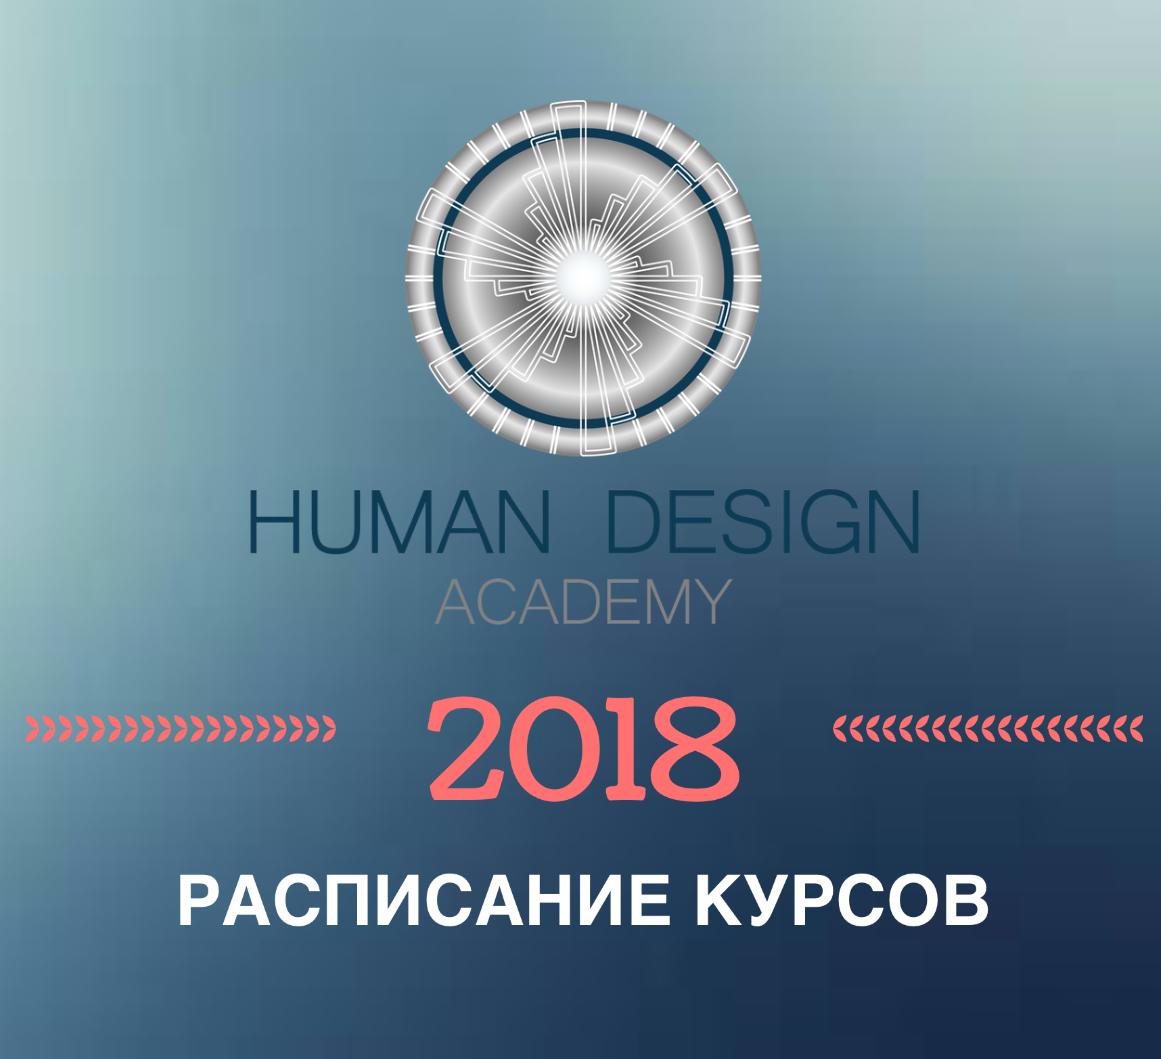 Планы Академии Дизайна Человека на 2018 год